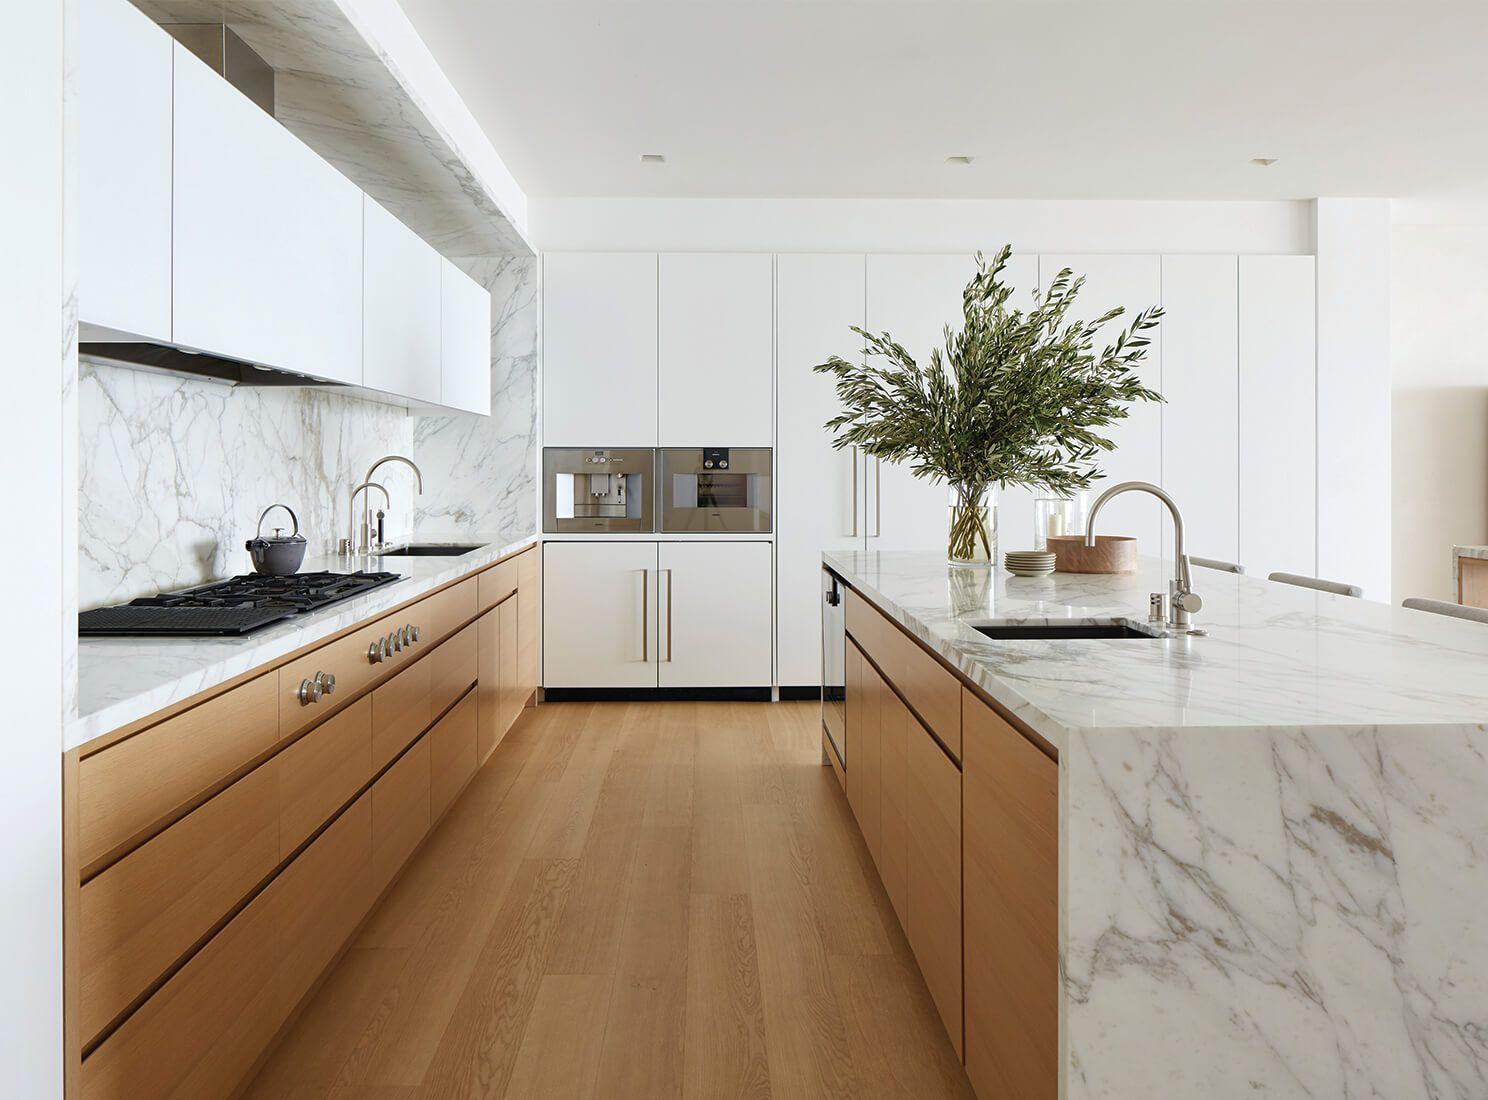 Minimalist kitchen with marble countertops